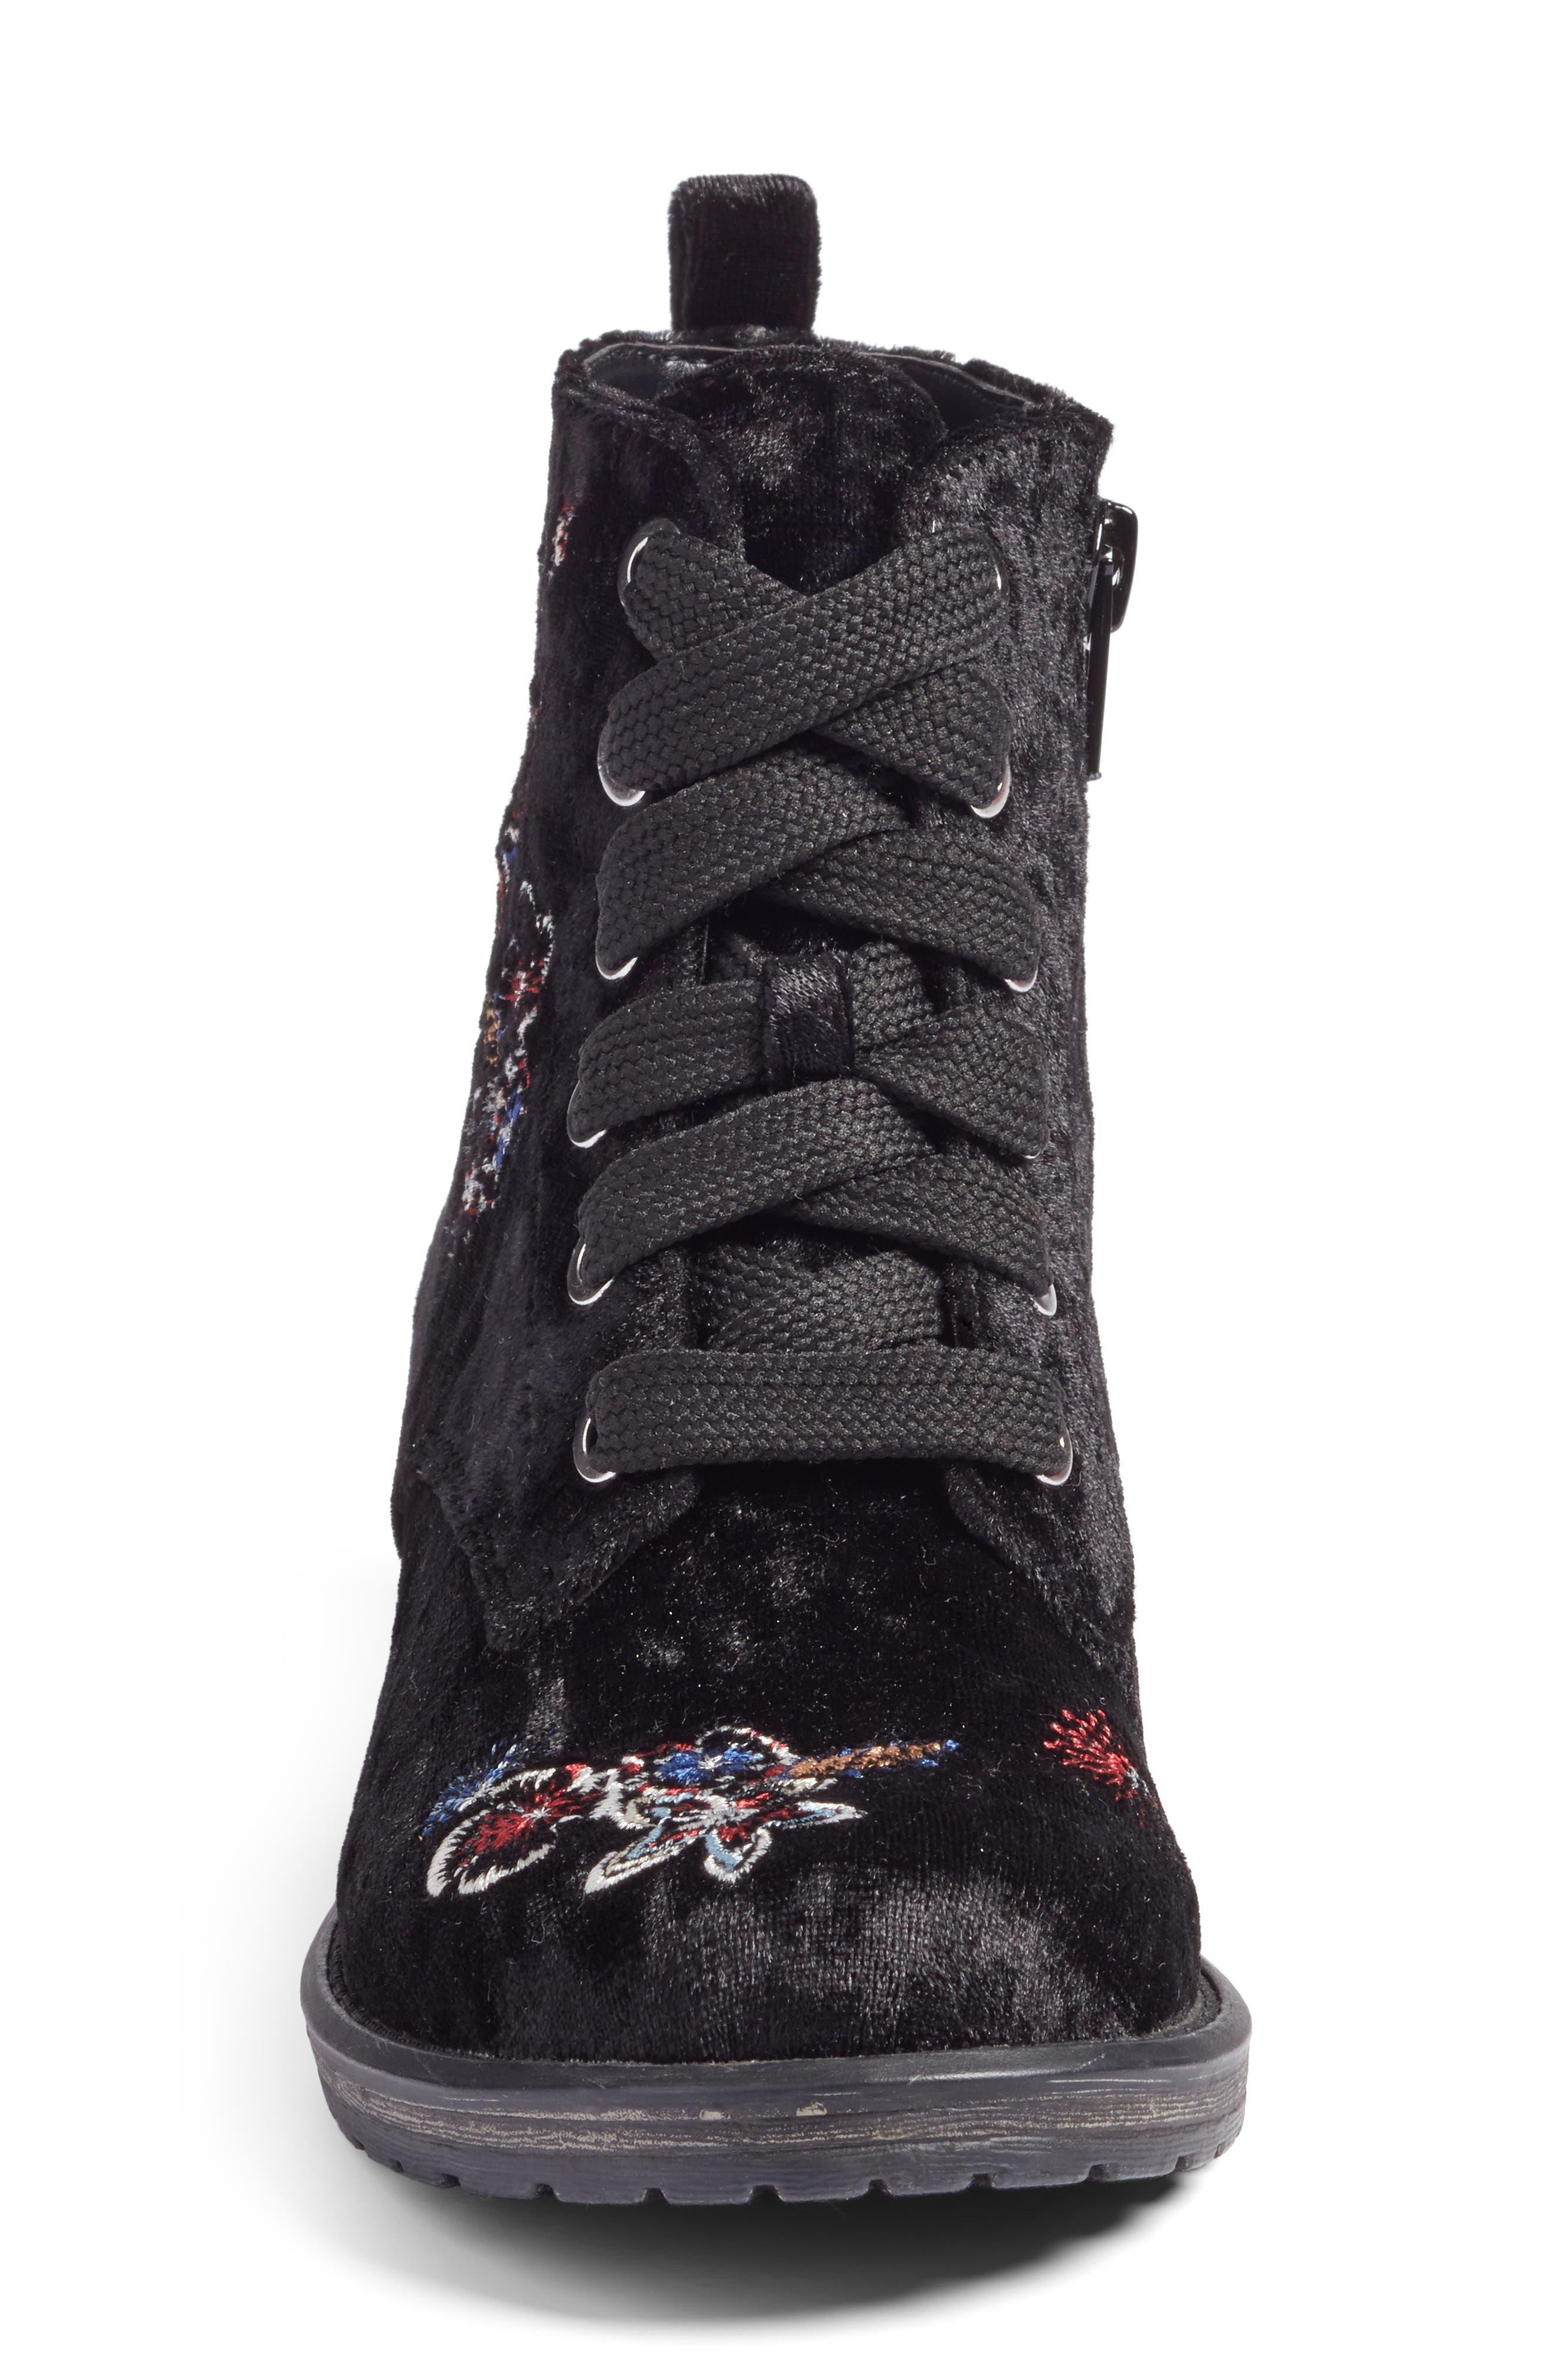 Lilla Combat Boot,                             Alternate thumbnail 4, color,                             Black Multi Velvet